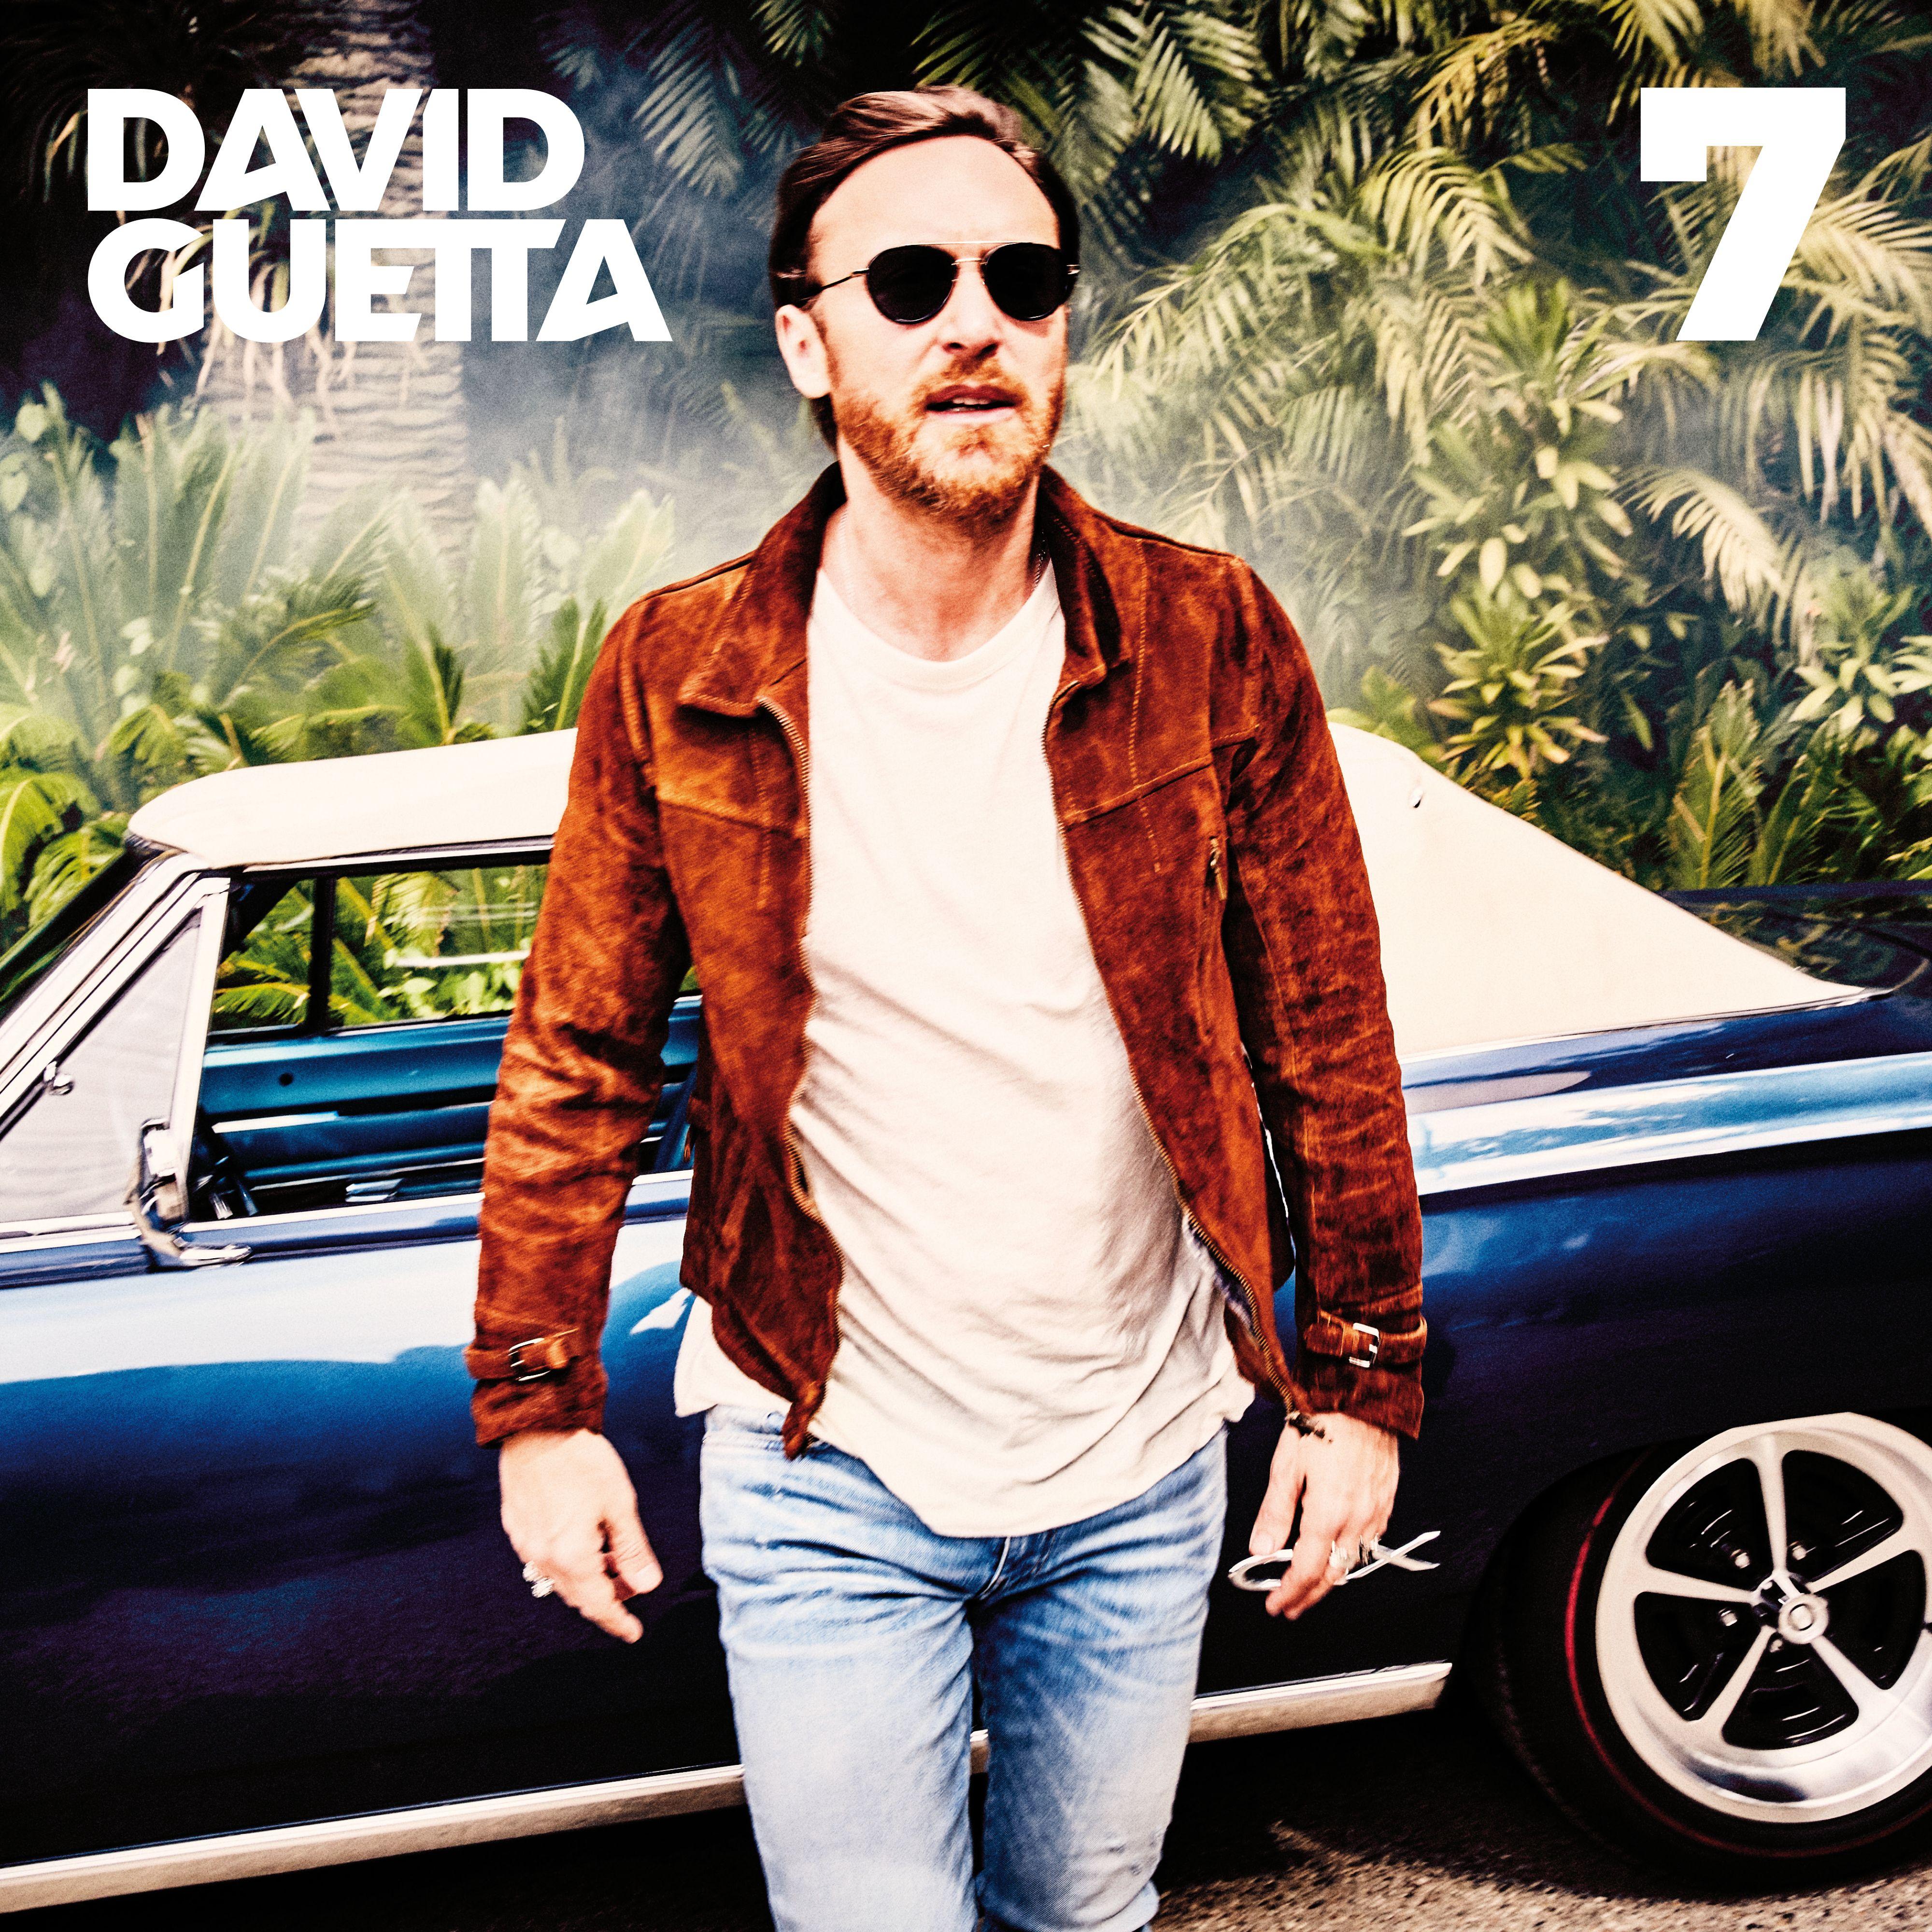 David Guetta - 7 album cover